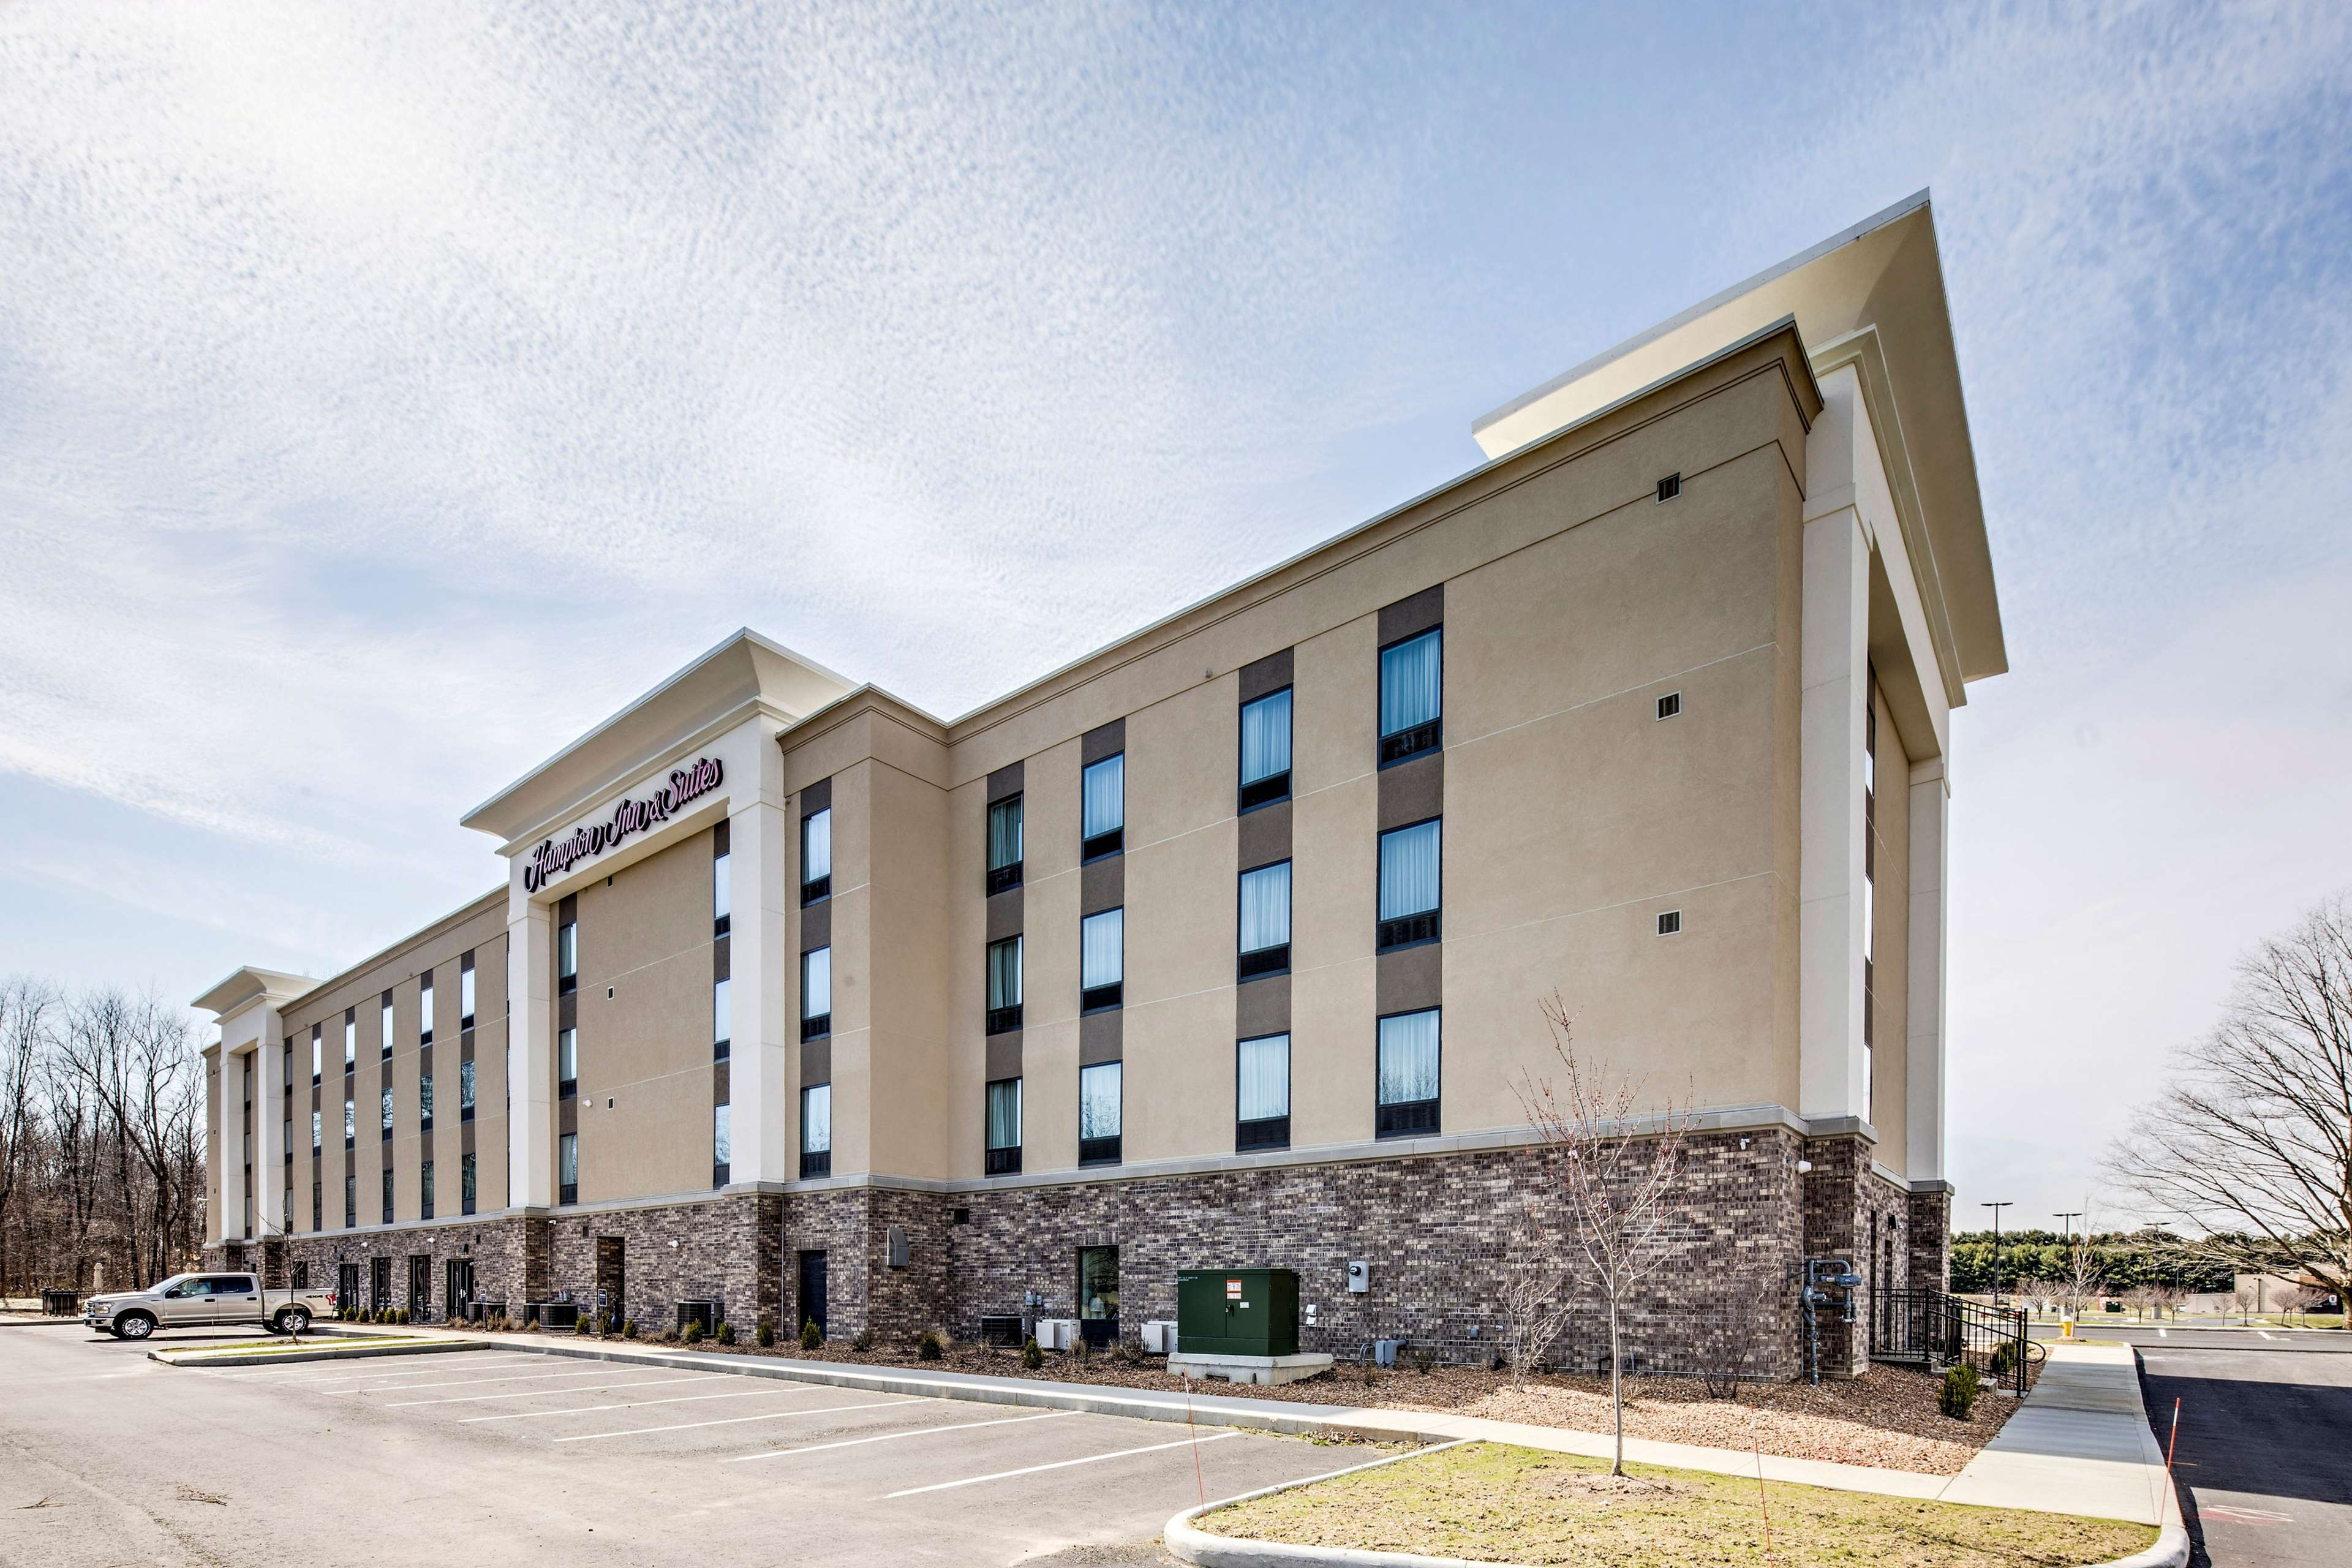 Hampton Inn & Suites Ashland